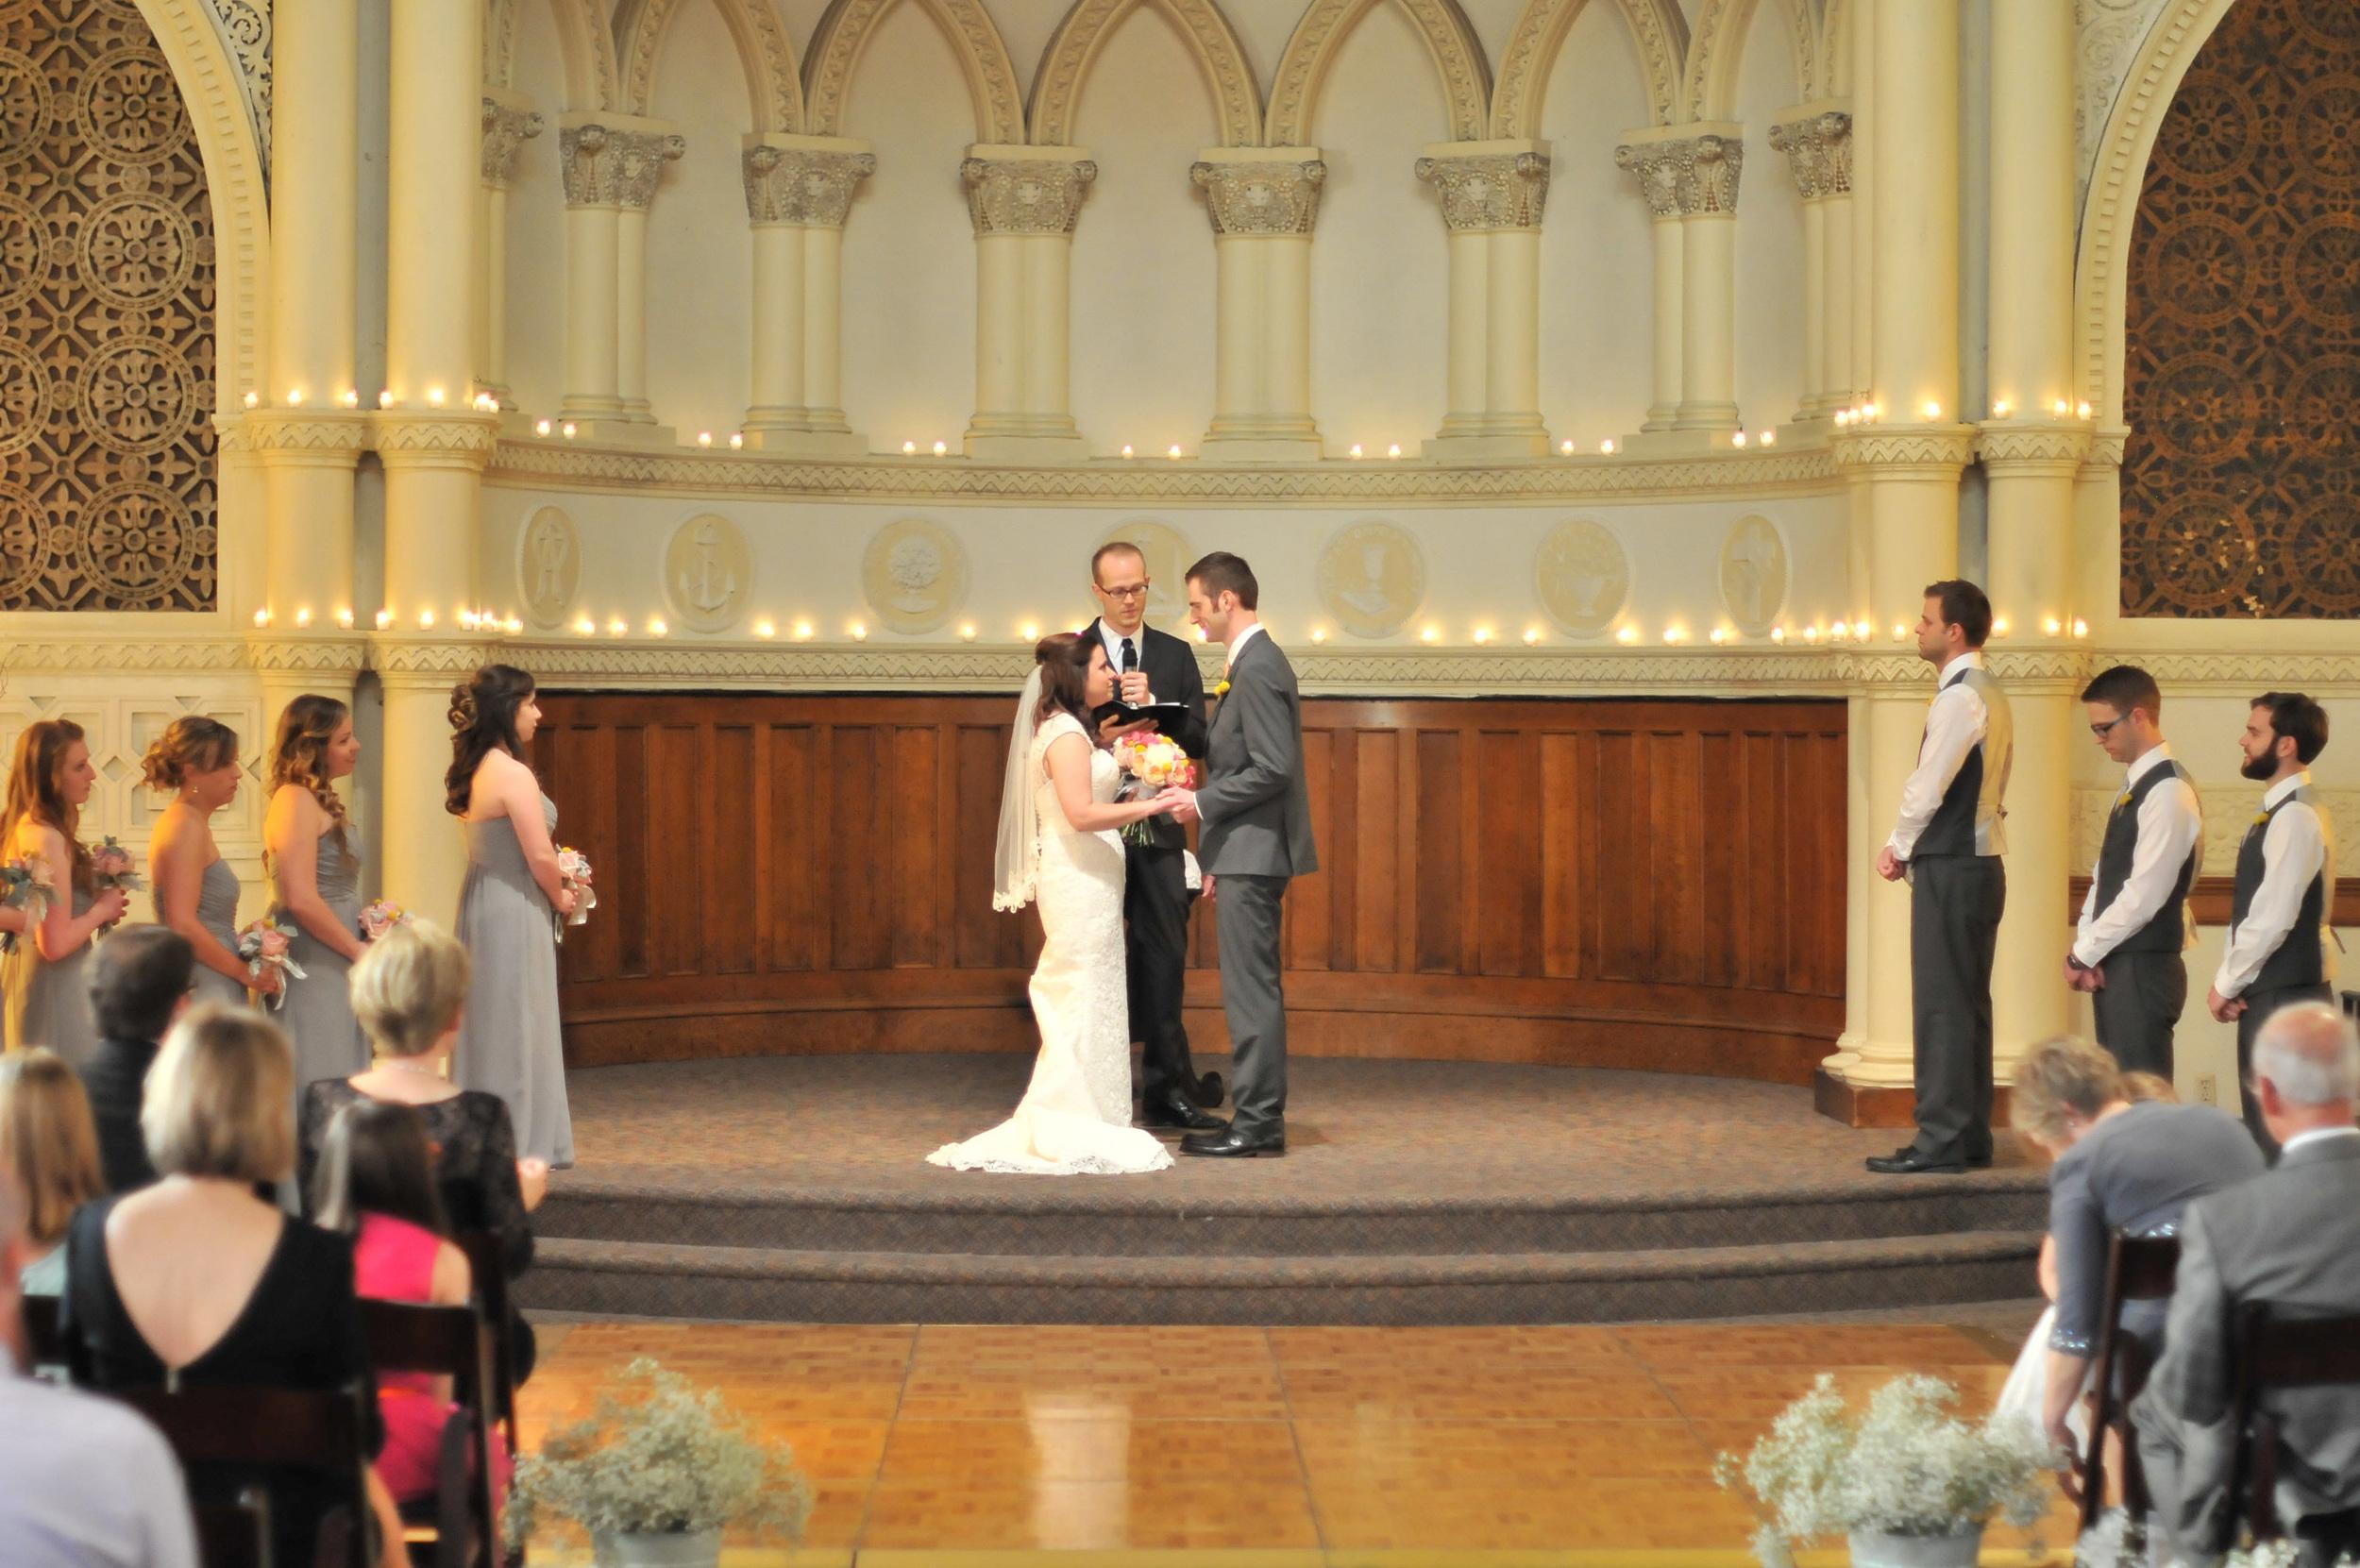 cornerstone-buidling-peoria-wedding-photographer-32.jpg